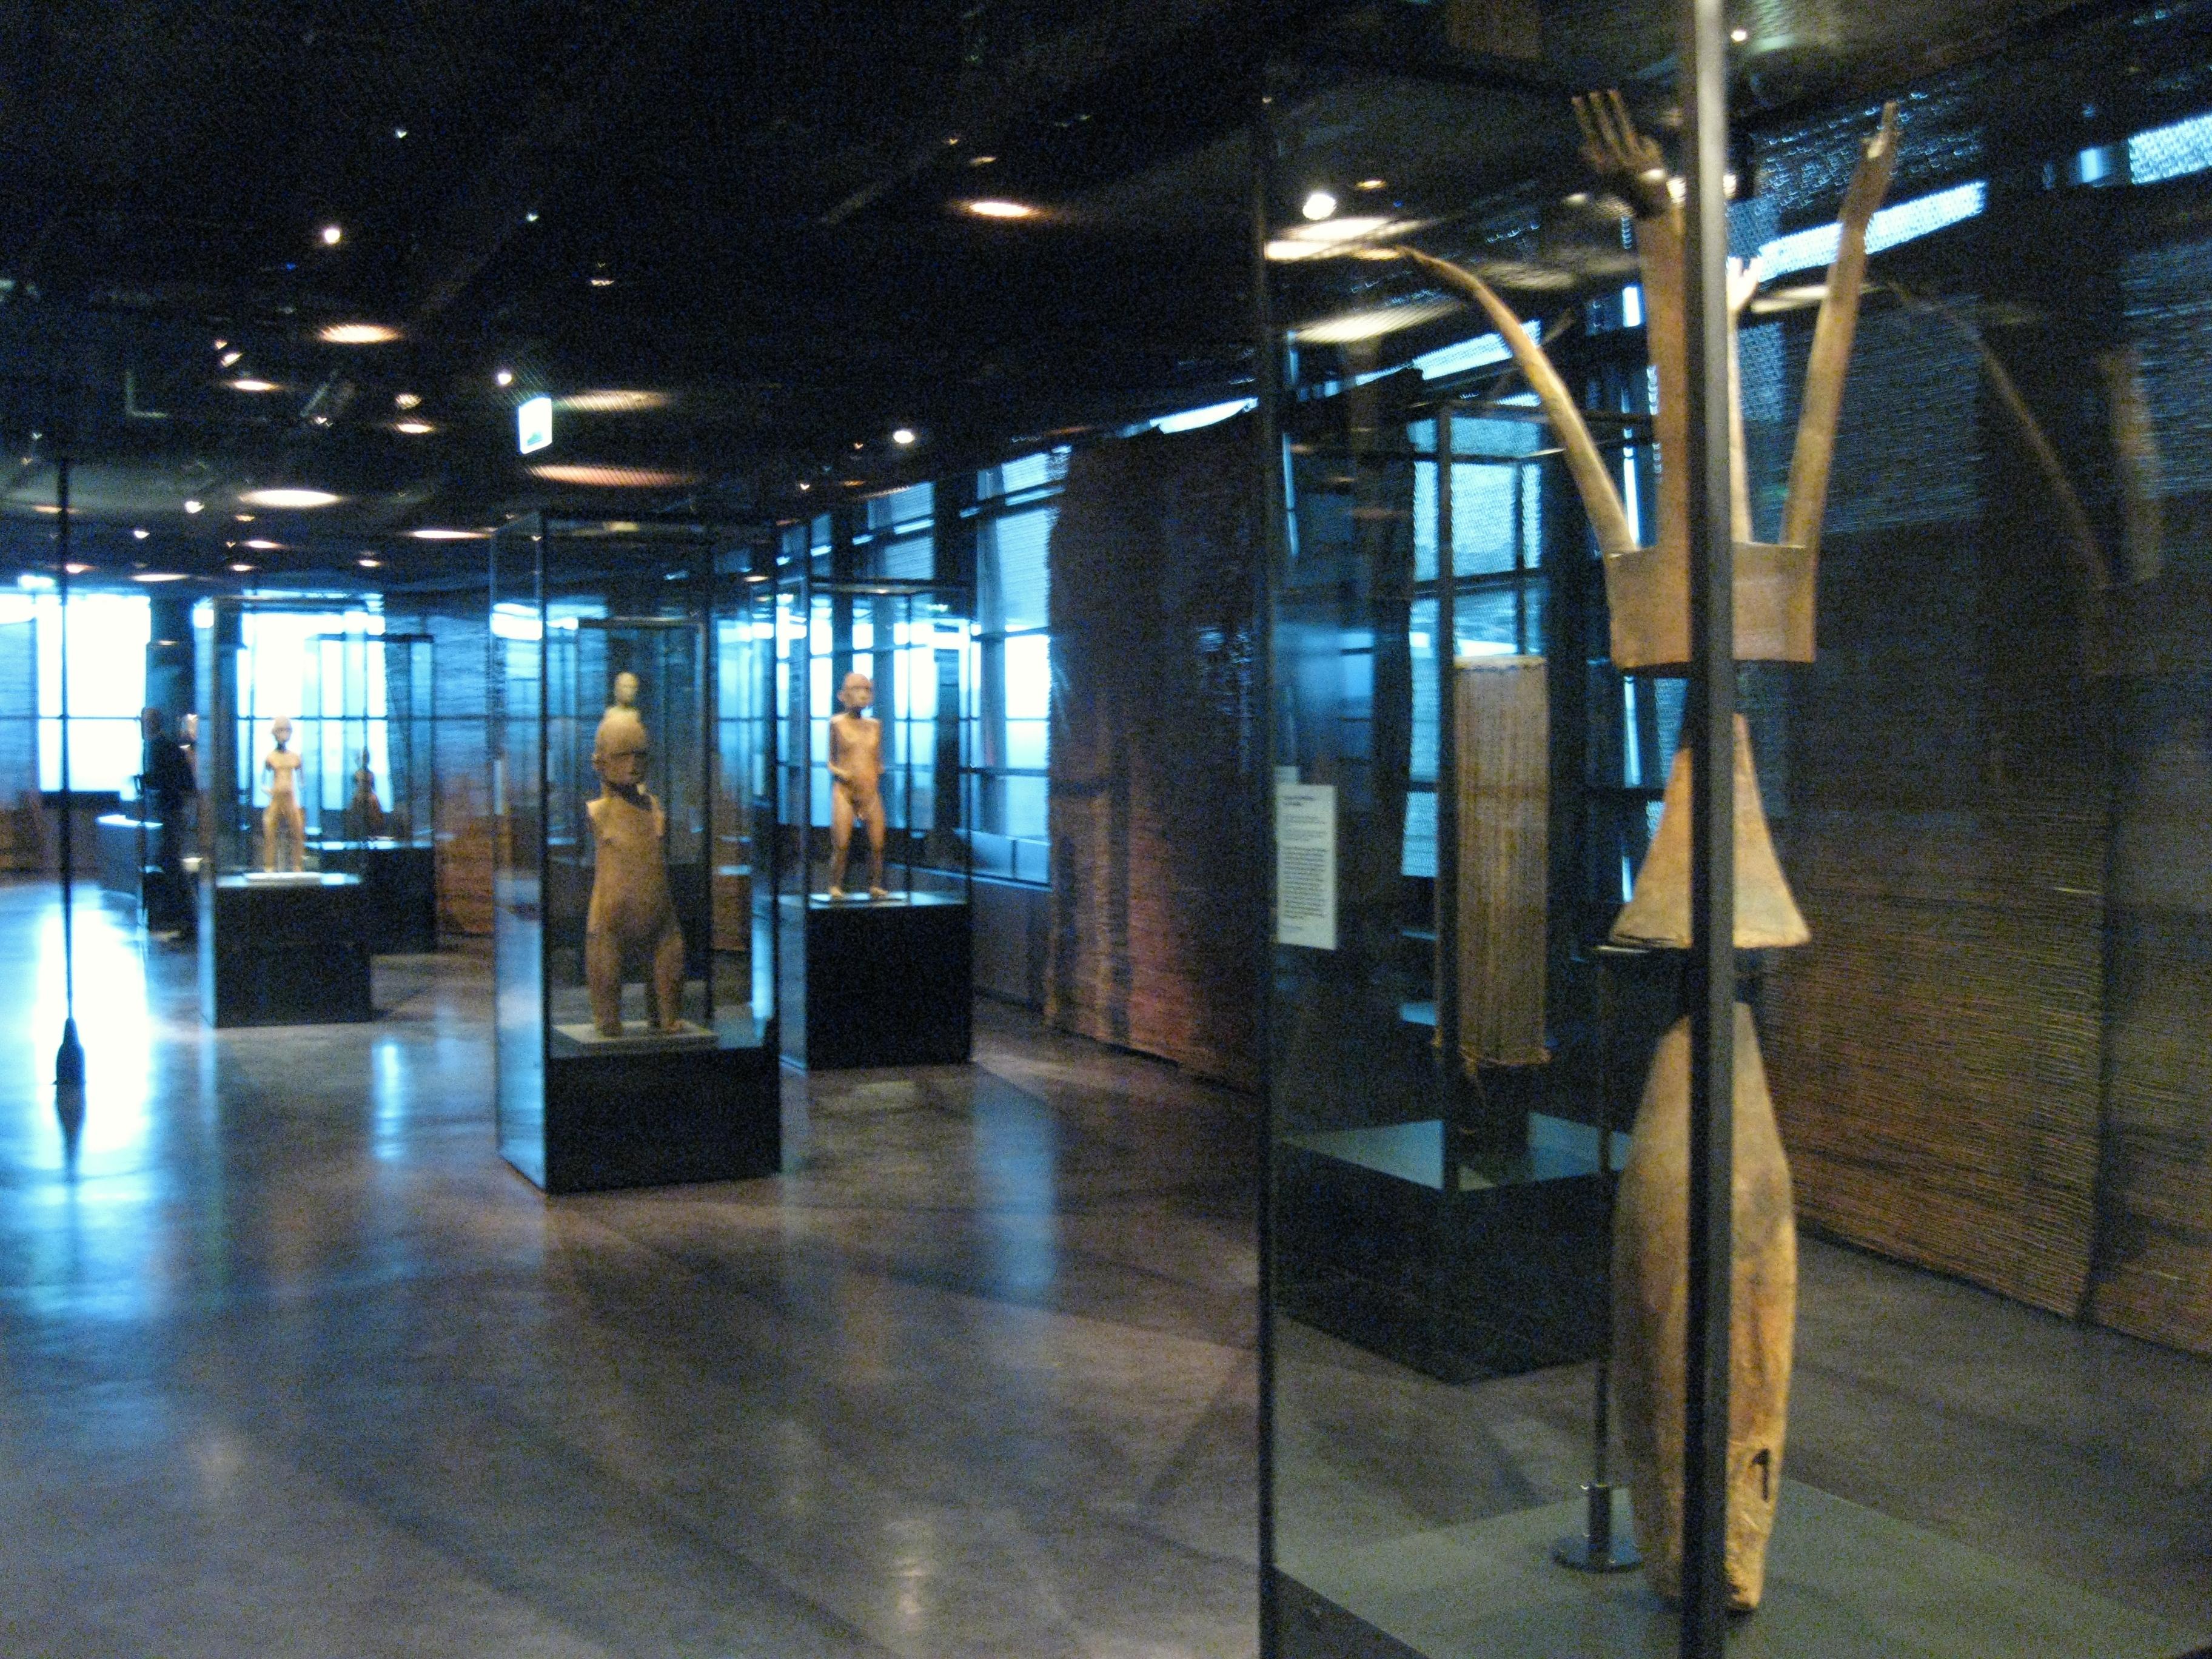 Mangareva, expo Paris, Salle sculpture, Poteau